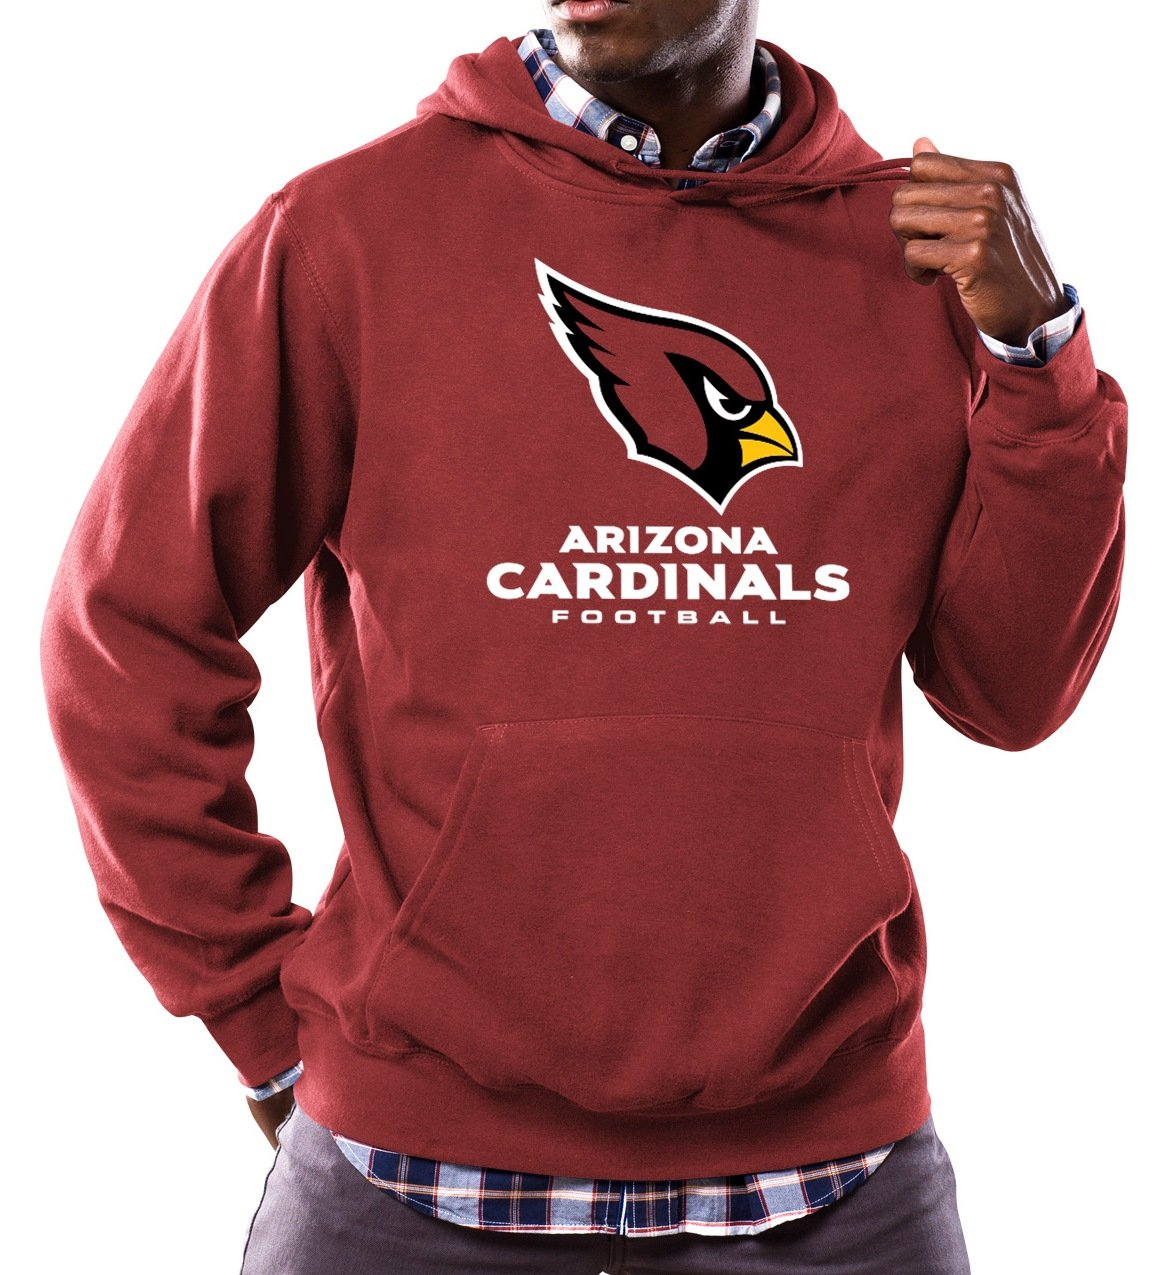 Arizona Cardinals Majestic NFL「Critical Victory 3